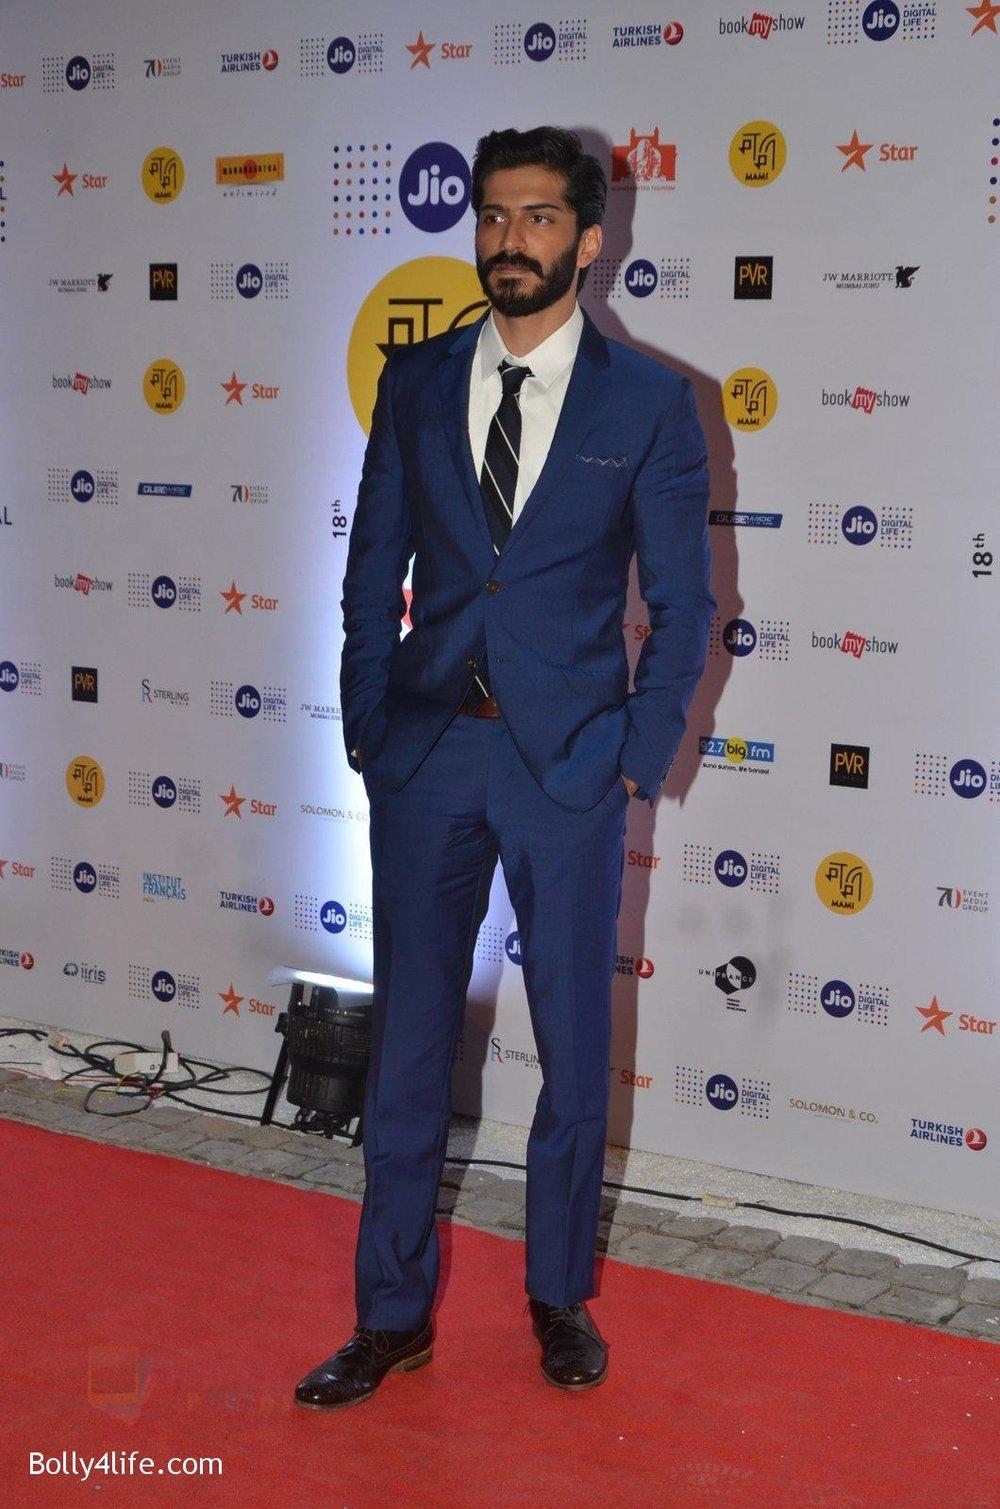 Harshvardhan-Kapoor-at-MAMI-Film-Festival-2016-on-20th-Oct-2016-307.jpg